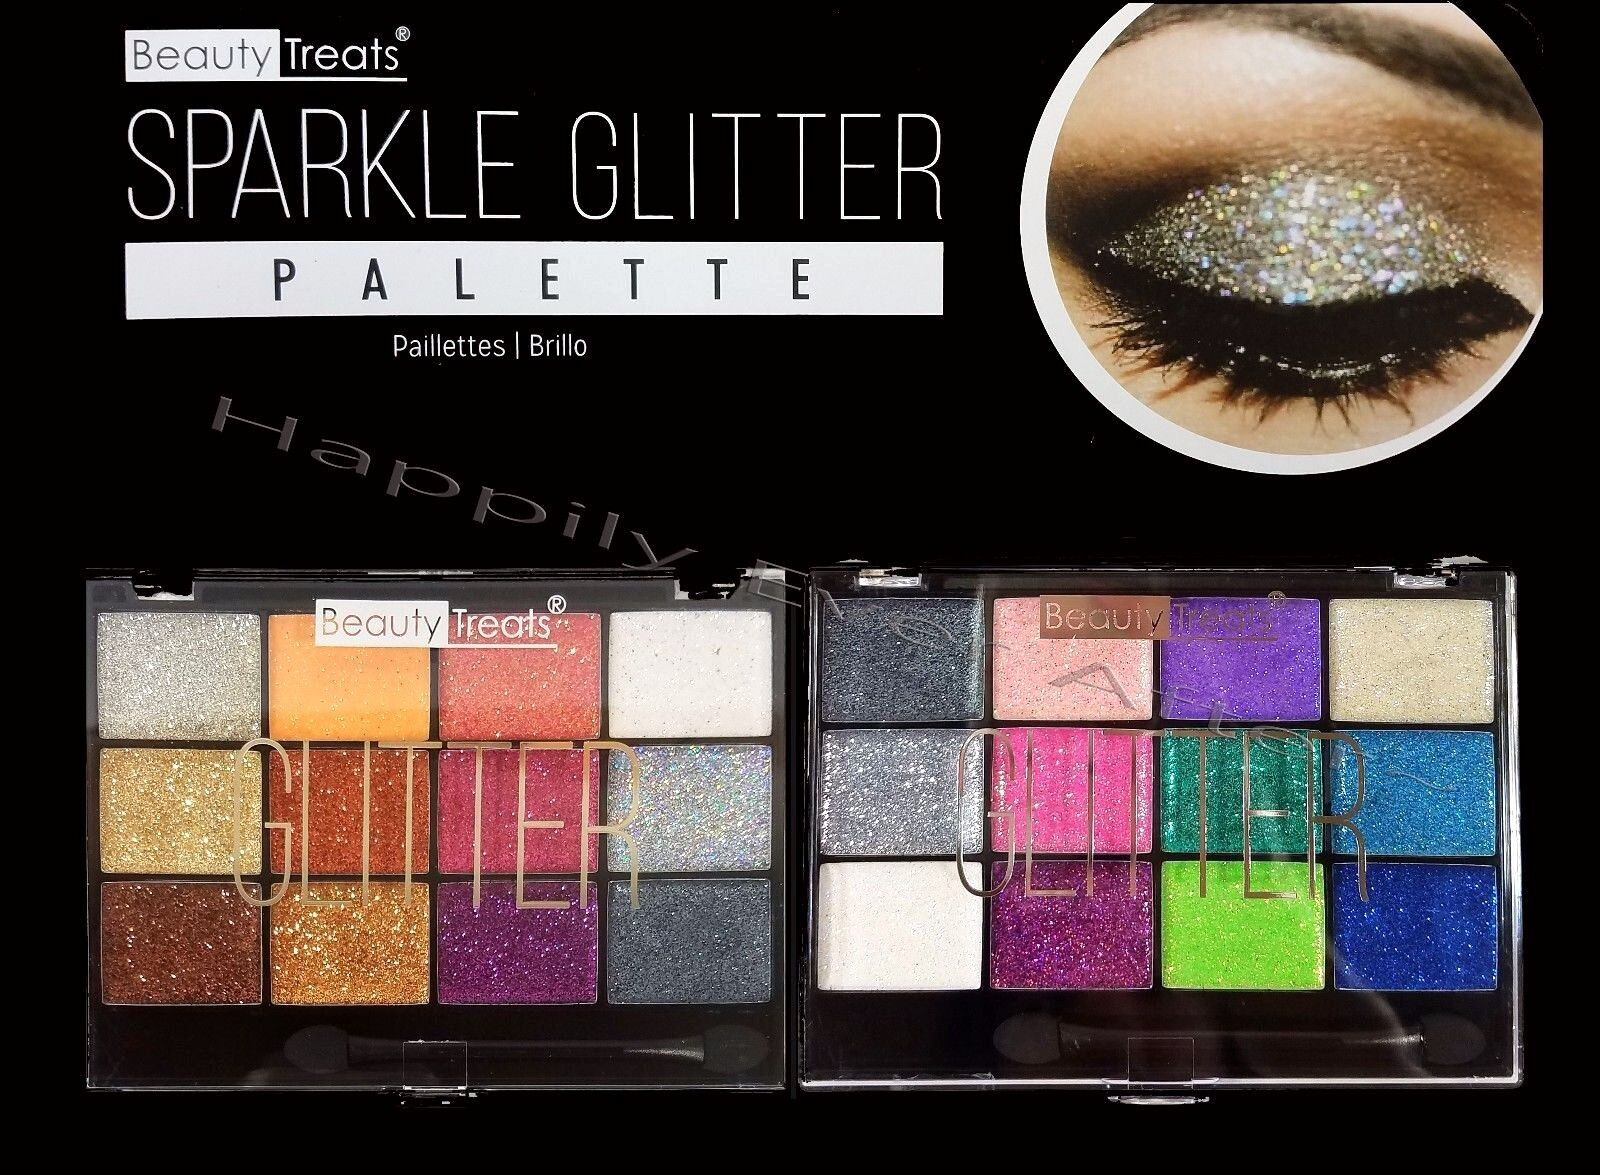 All 2 Palettes! Beauty Treats Sparkle Glitter Eyeshadow Pale